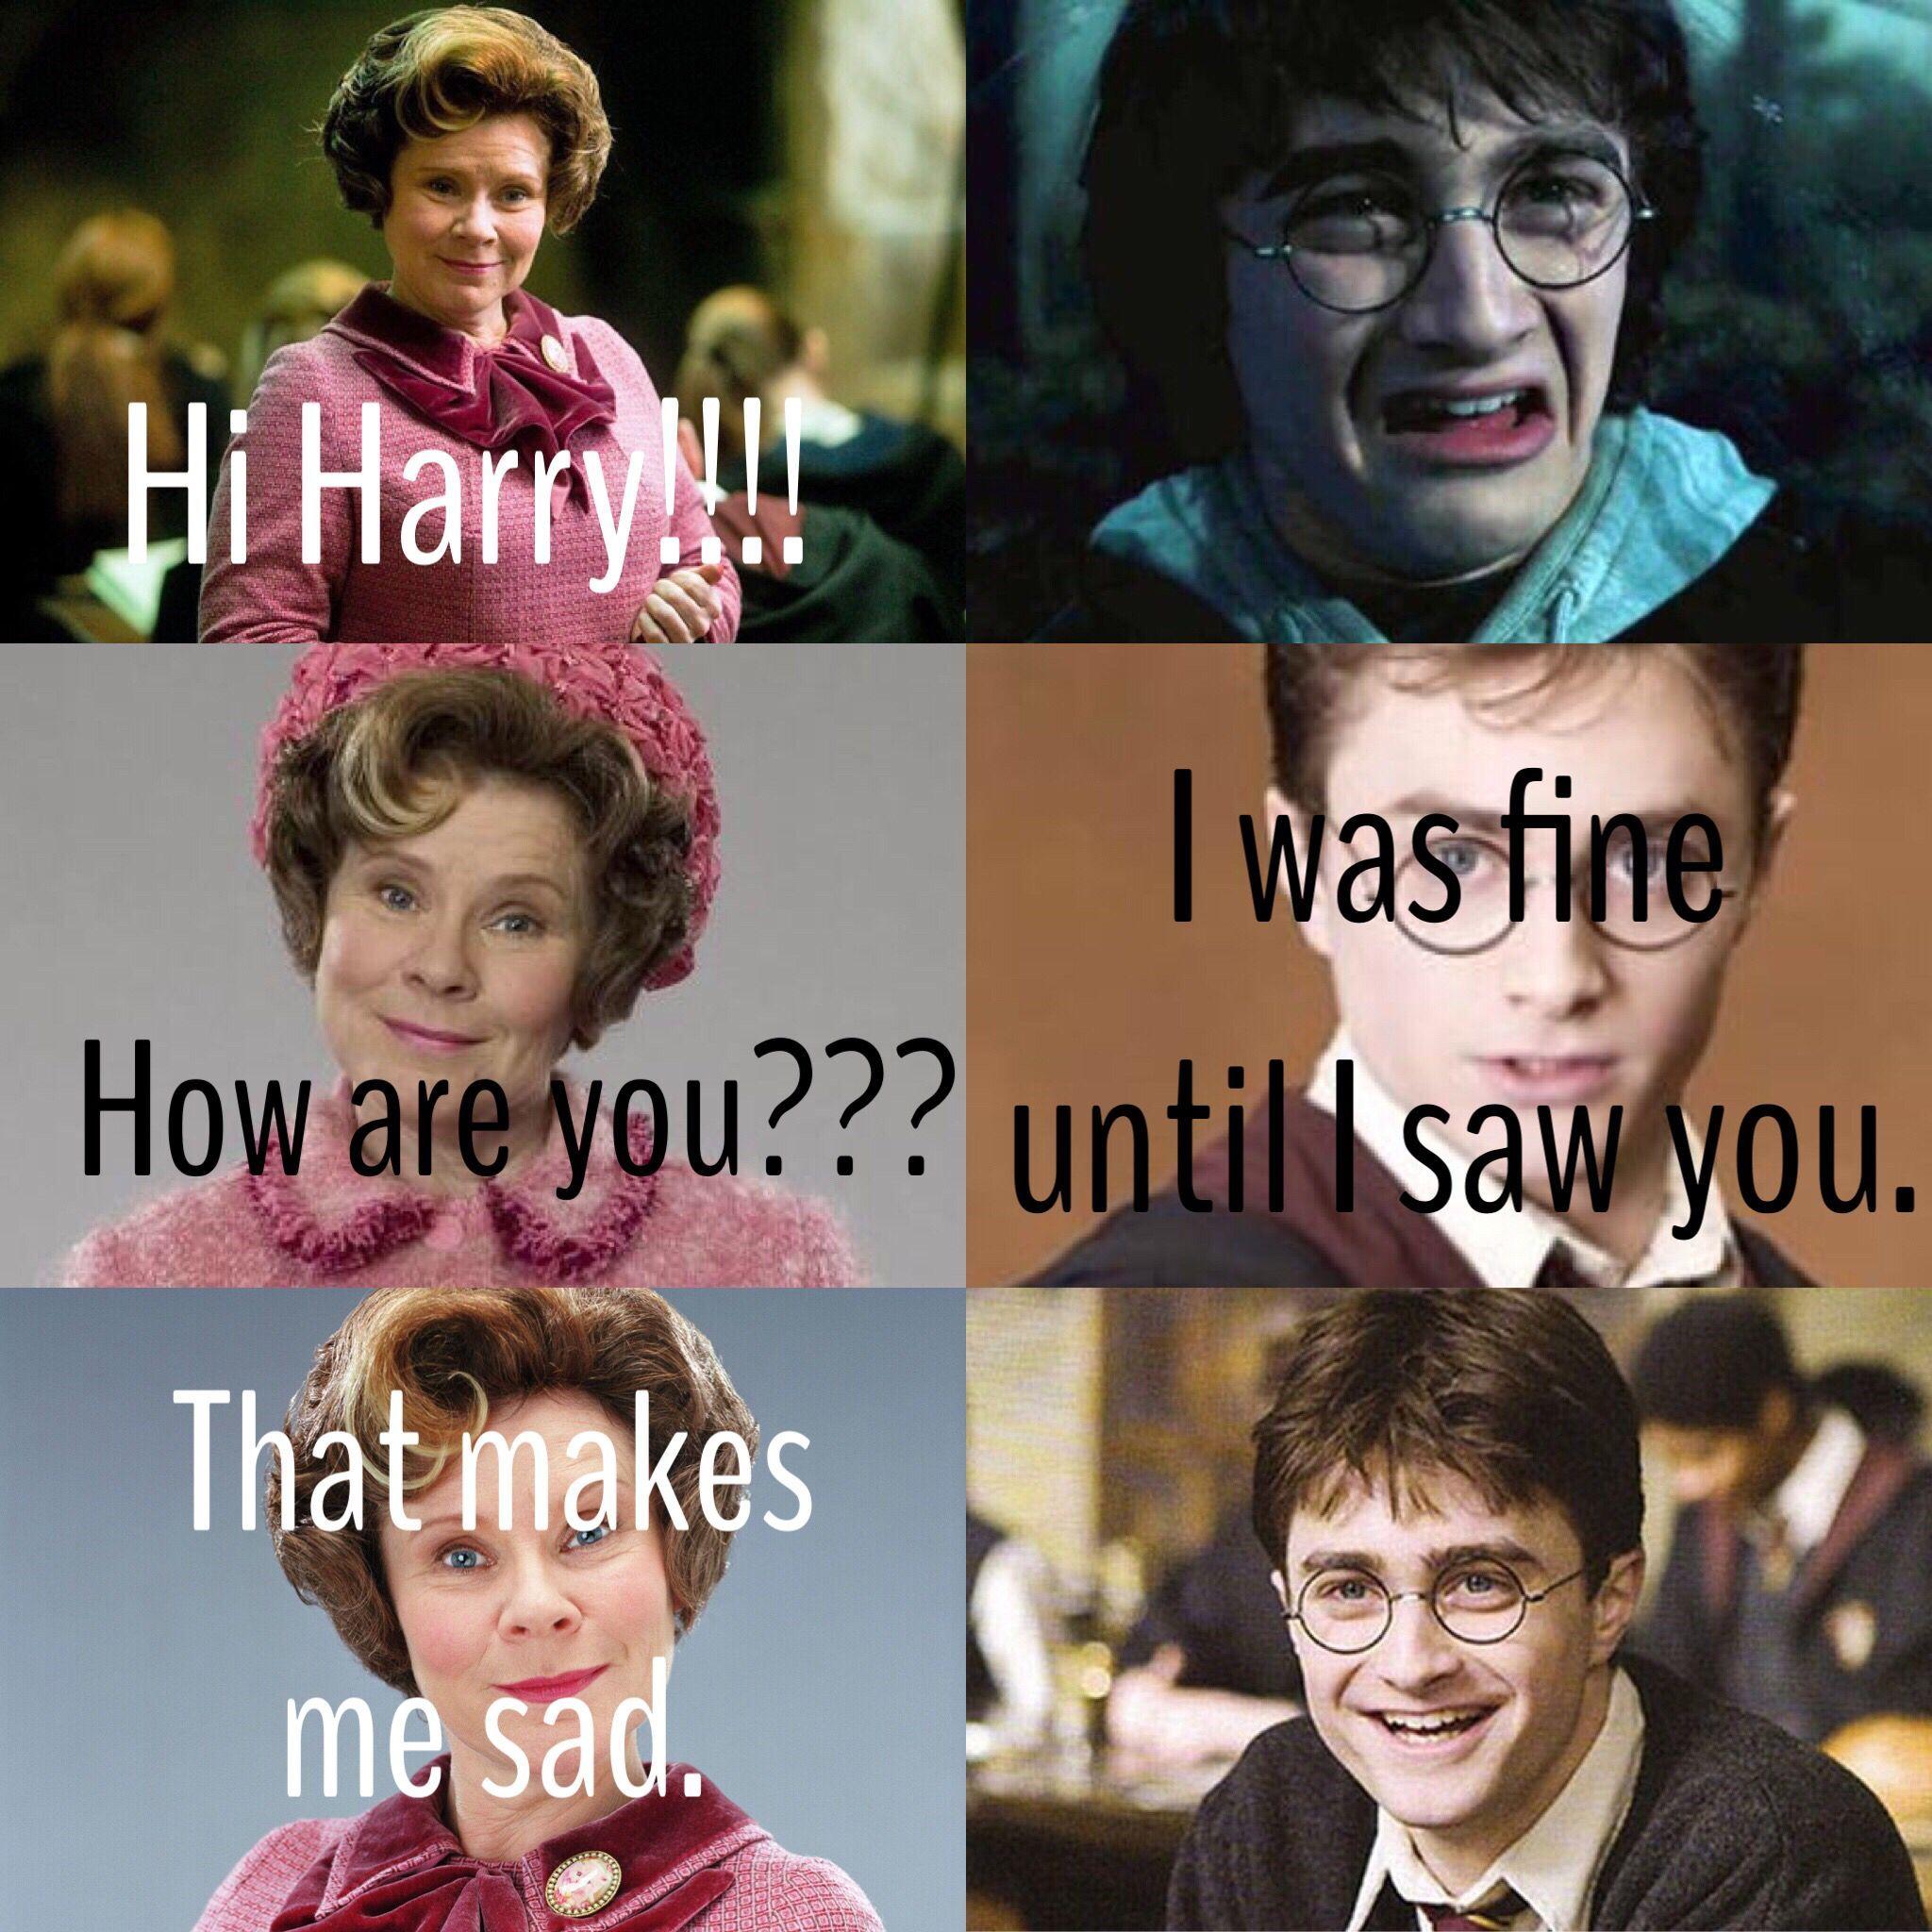 Harrypottermemes Harry Potter Lustig Harry Potter Fanfiction Harry Potter Film